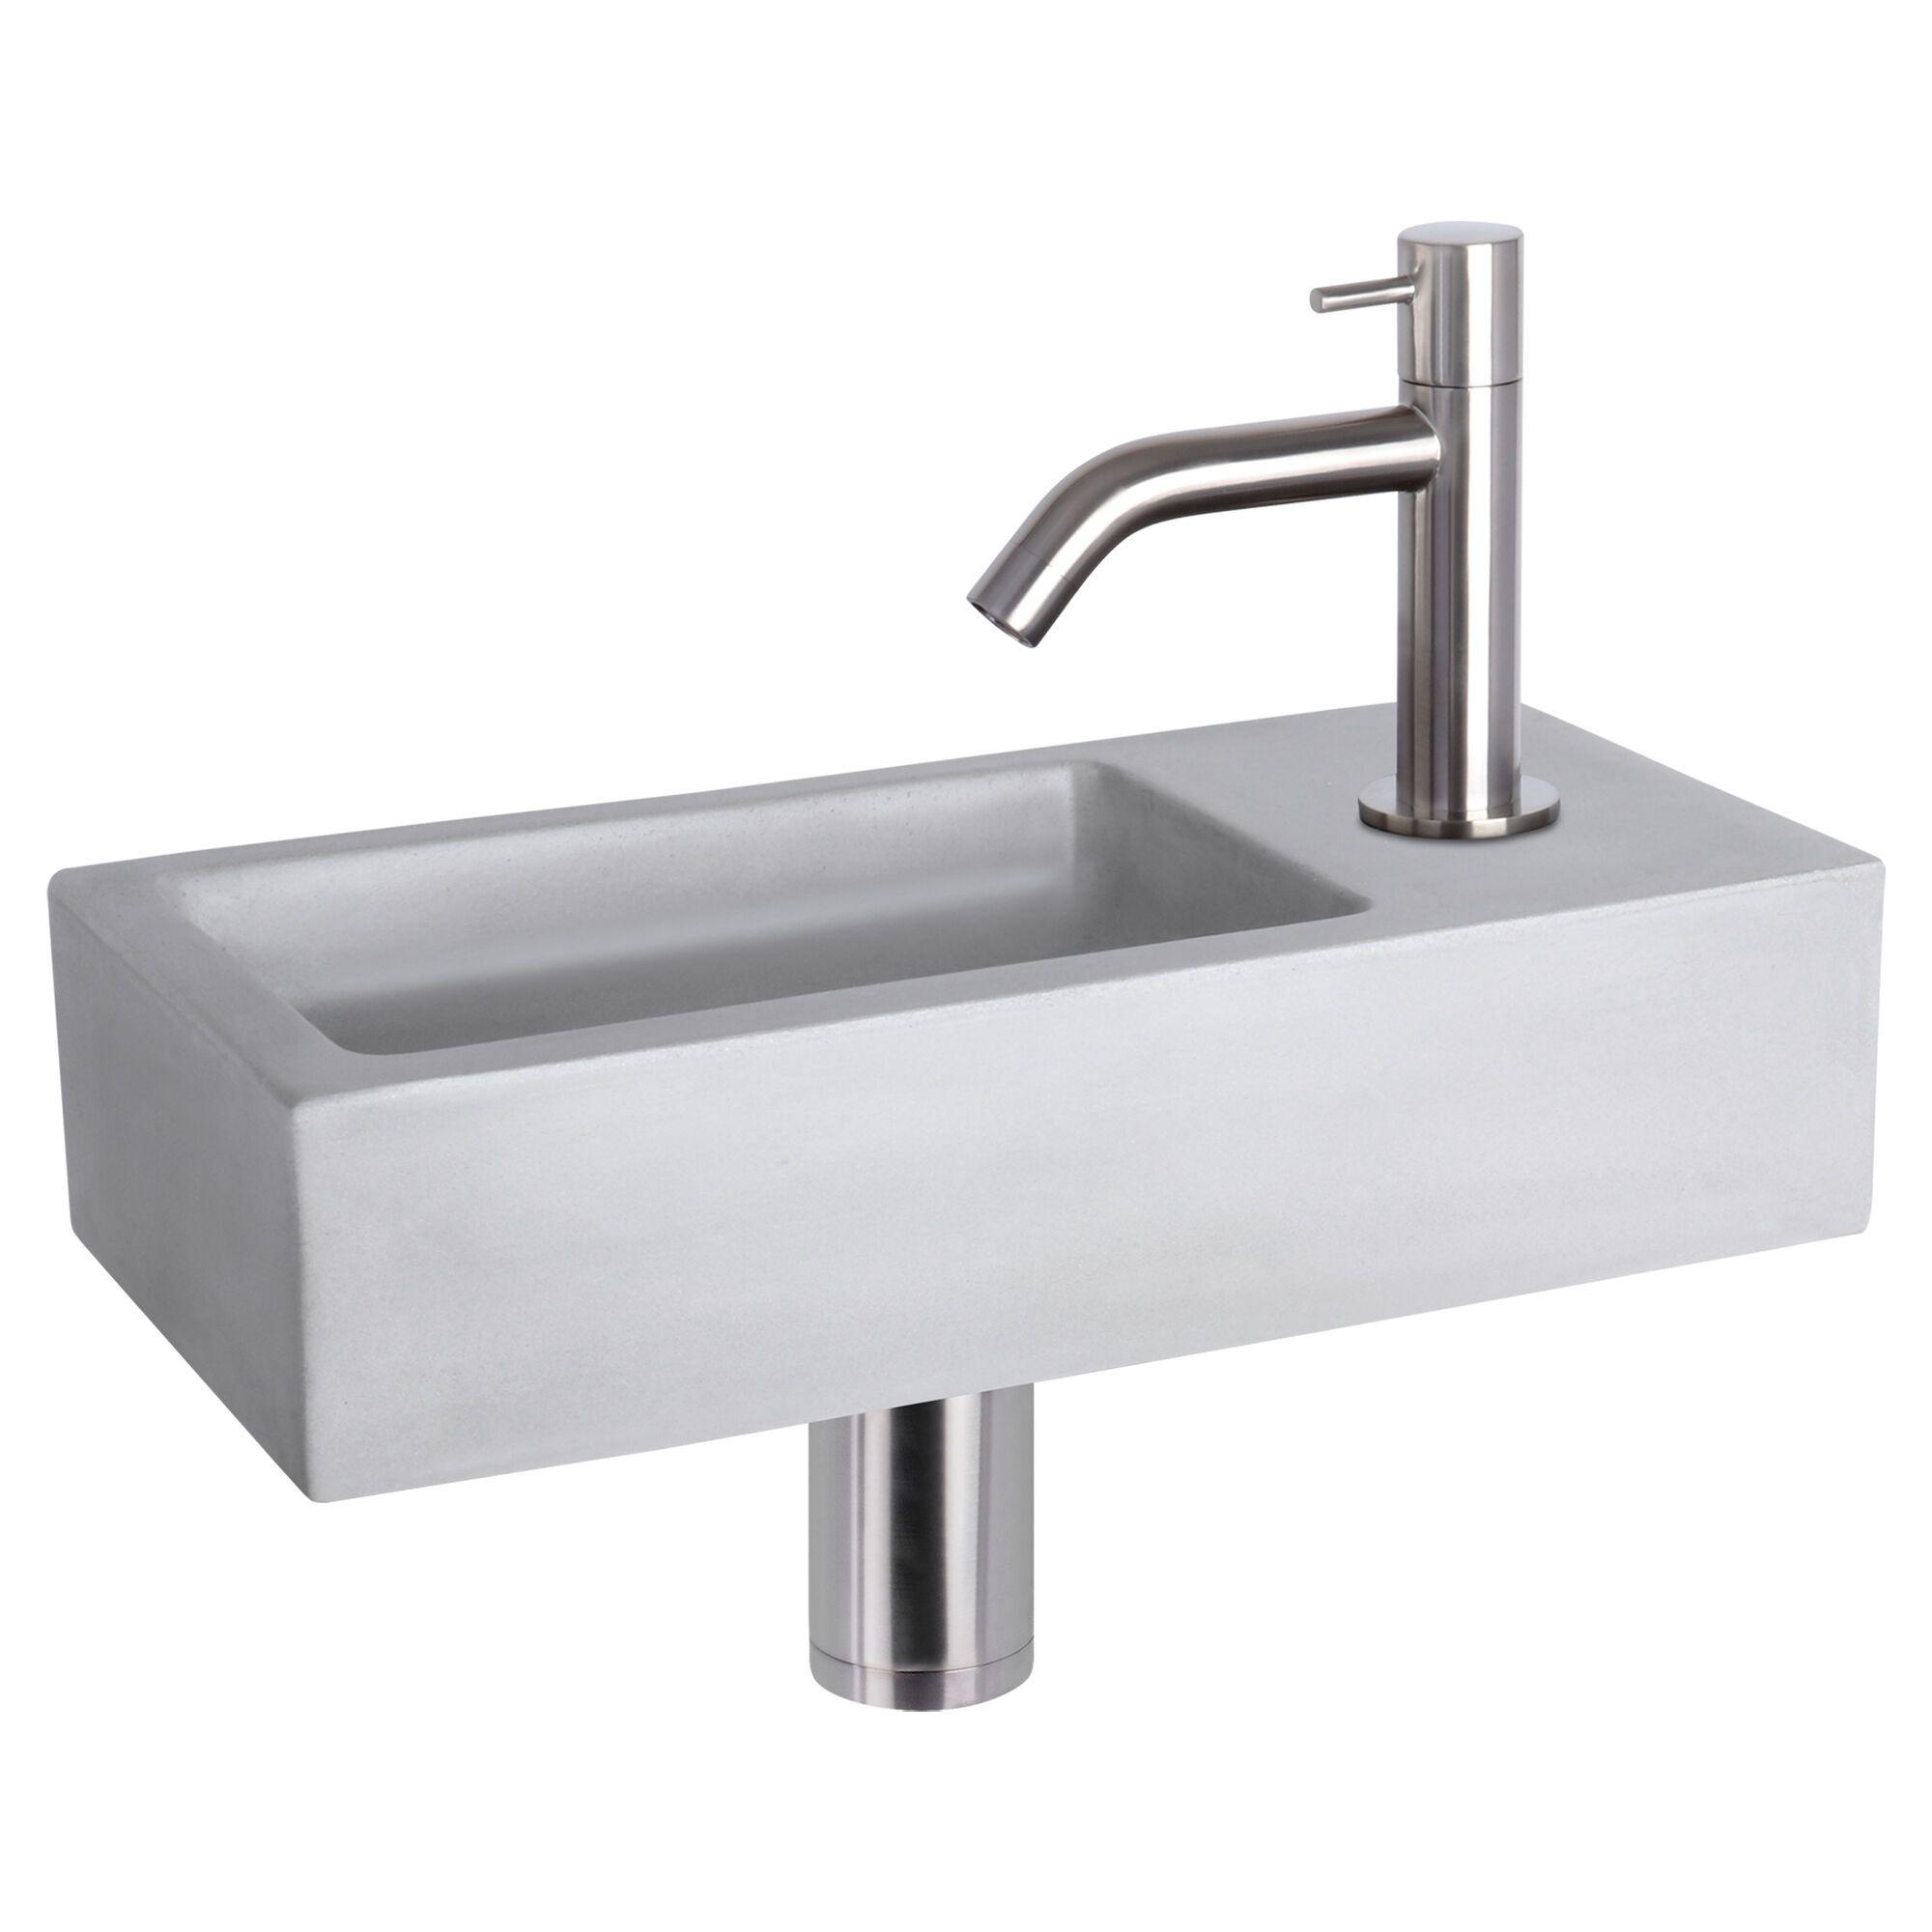 WC Fontein Ravo Gebogen Kraan | Fonteinset Beton met Chroom | Betonnen Wastafel